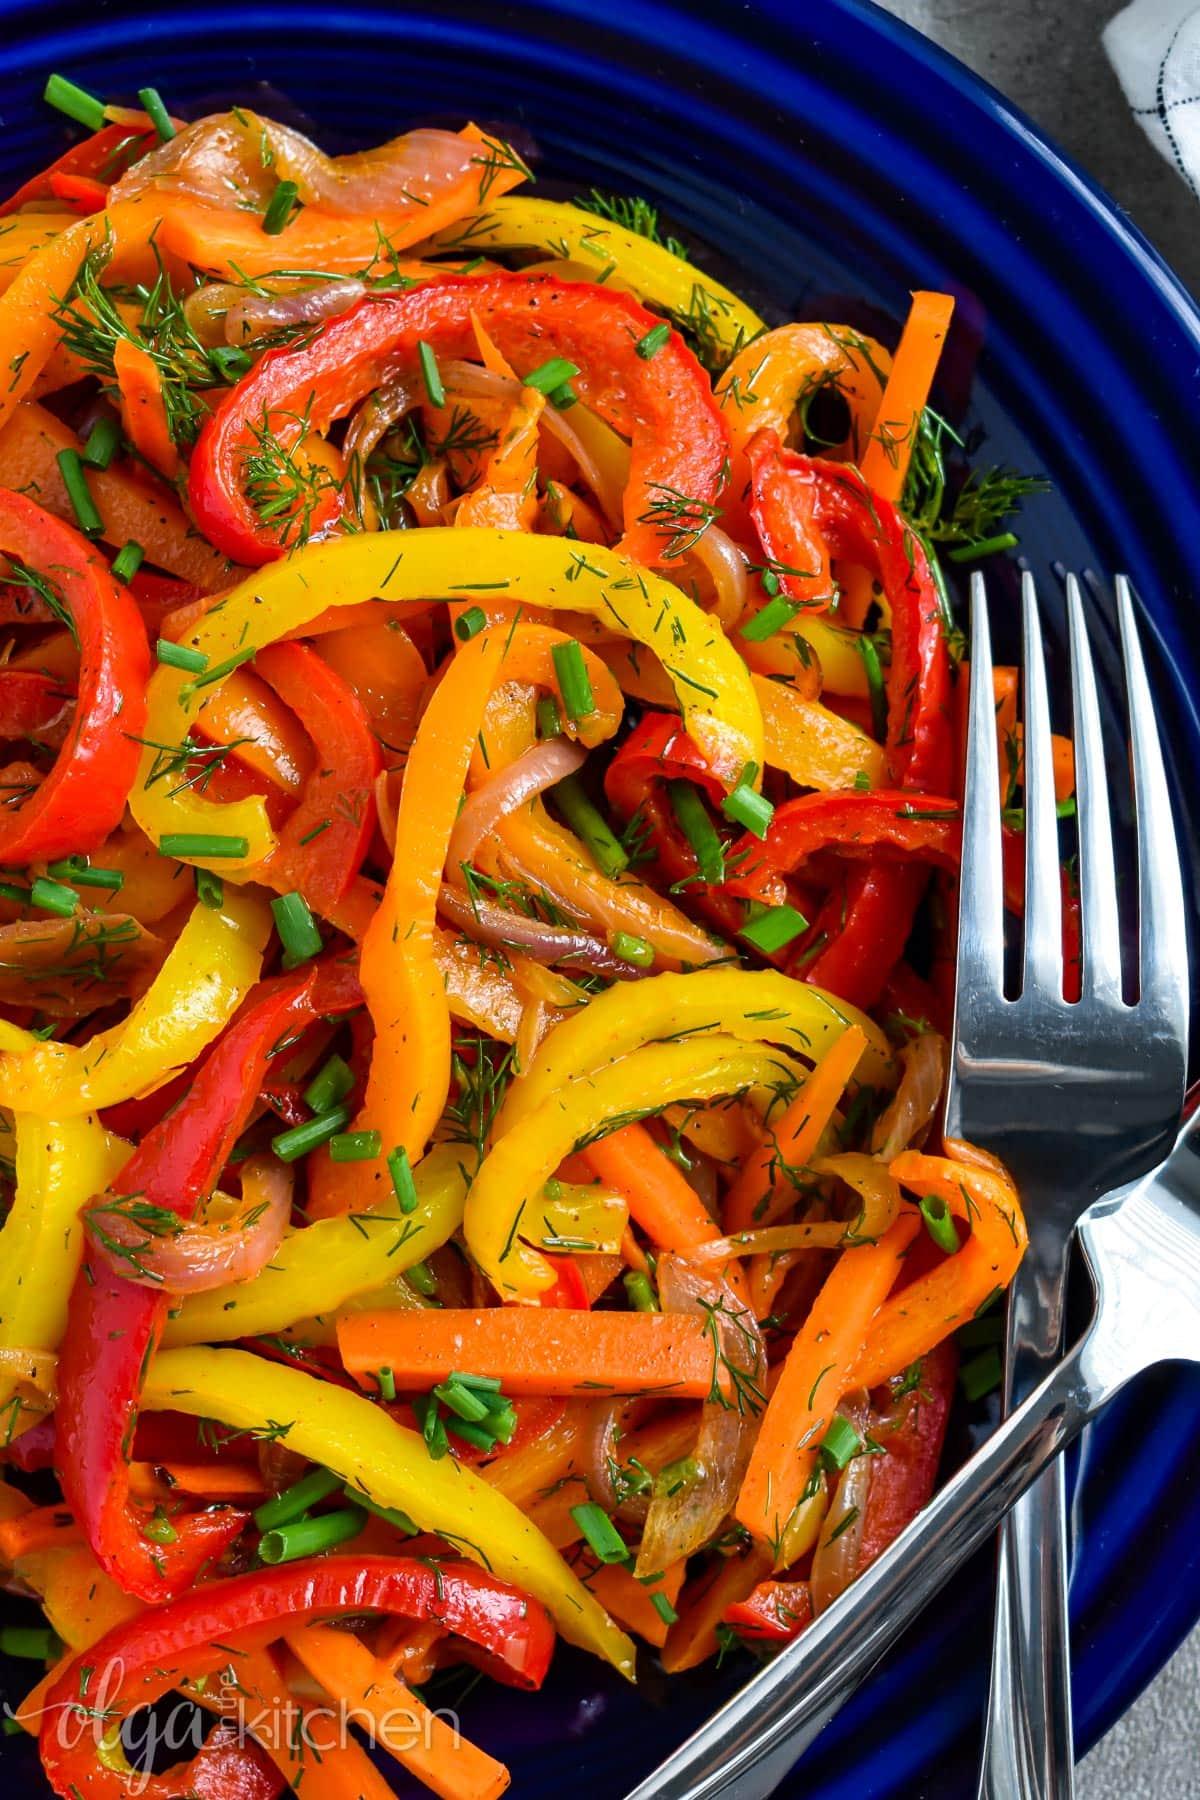 Oven roasted pepper salad recipe.